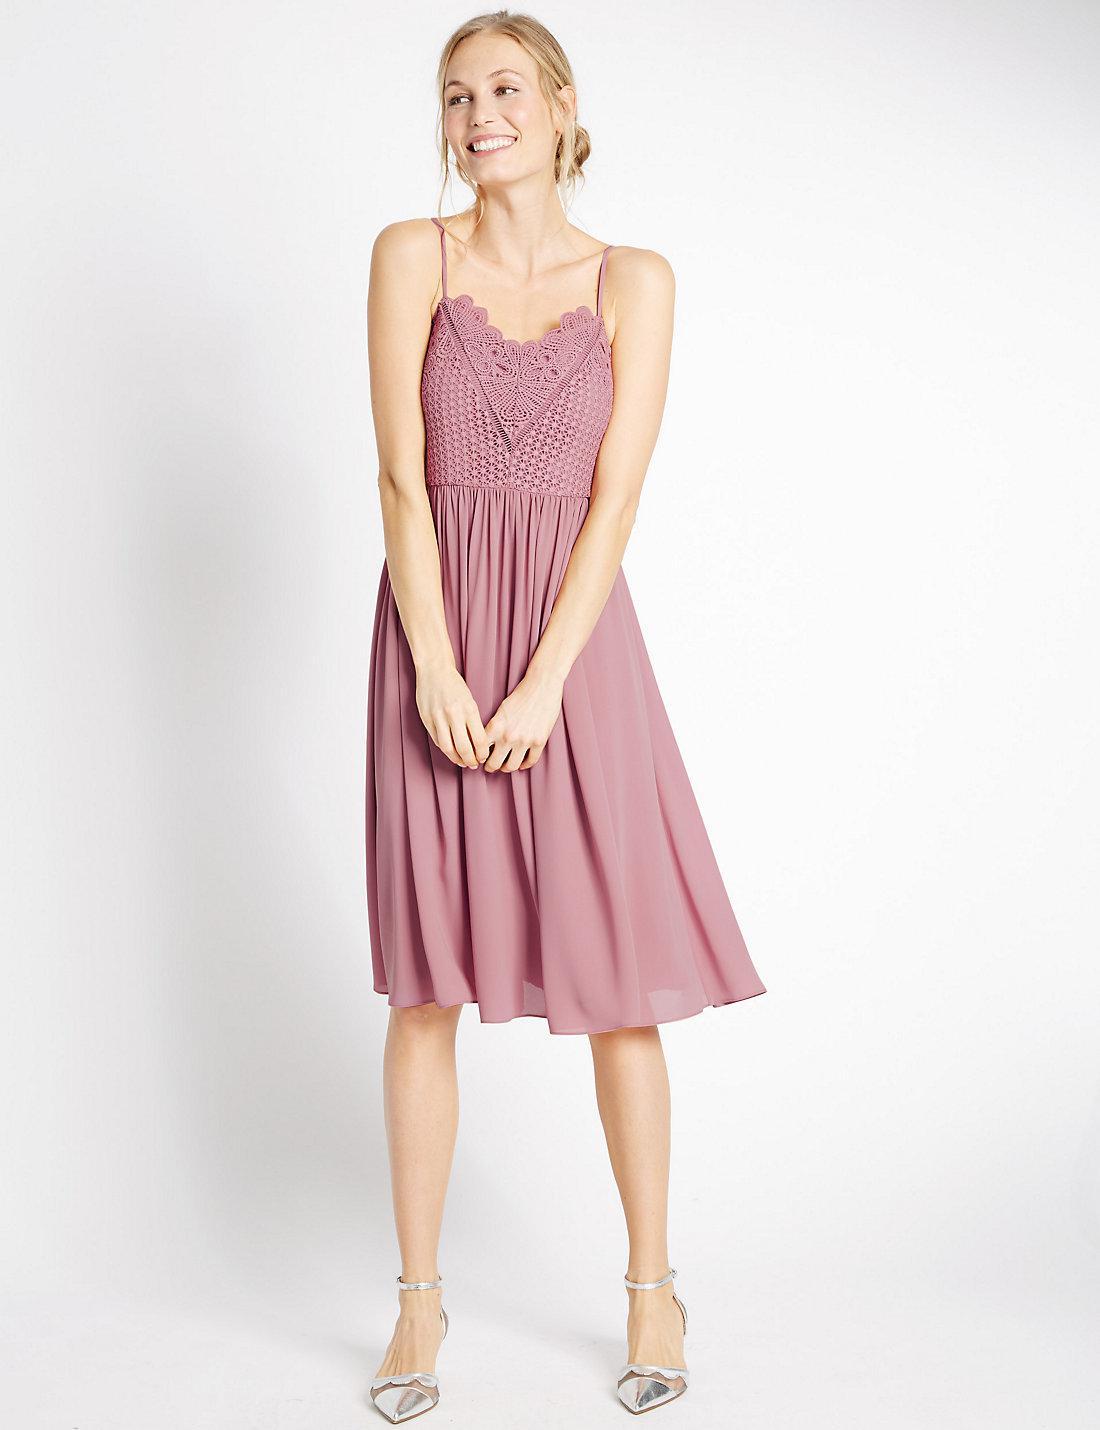 Wunderbar Marks And Spencer Party Dresses Zeitgenössisch ...